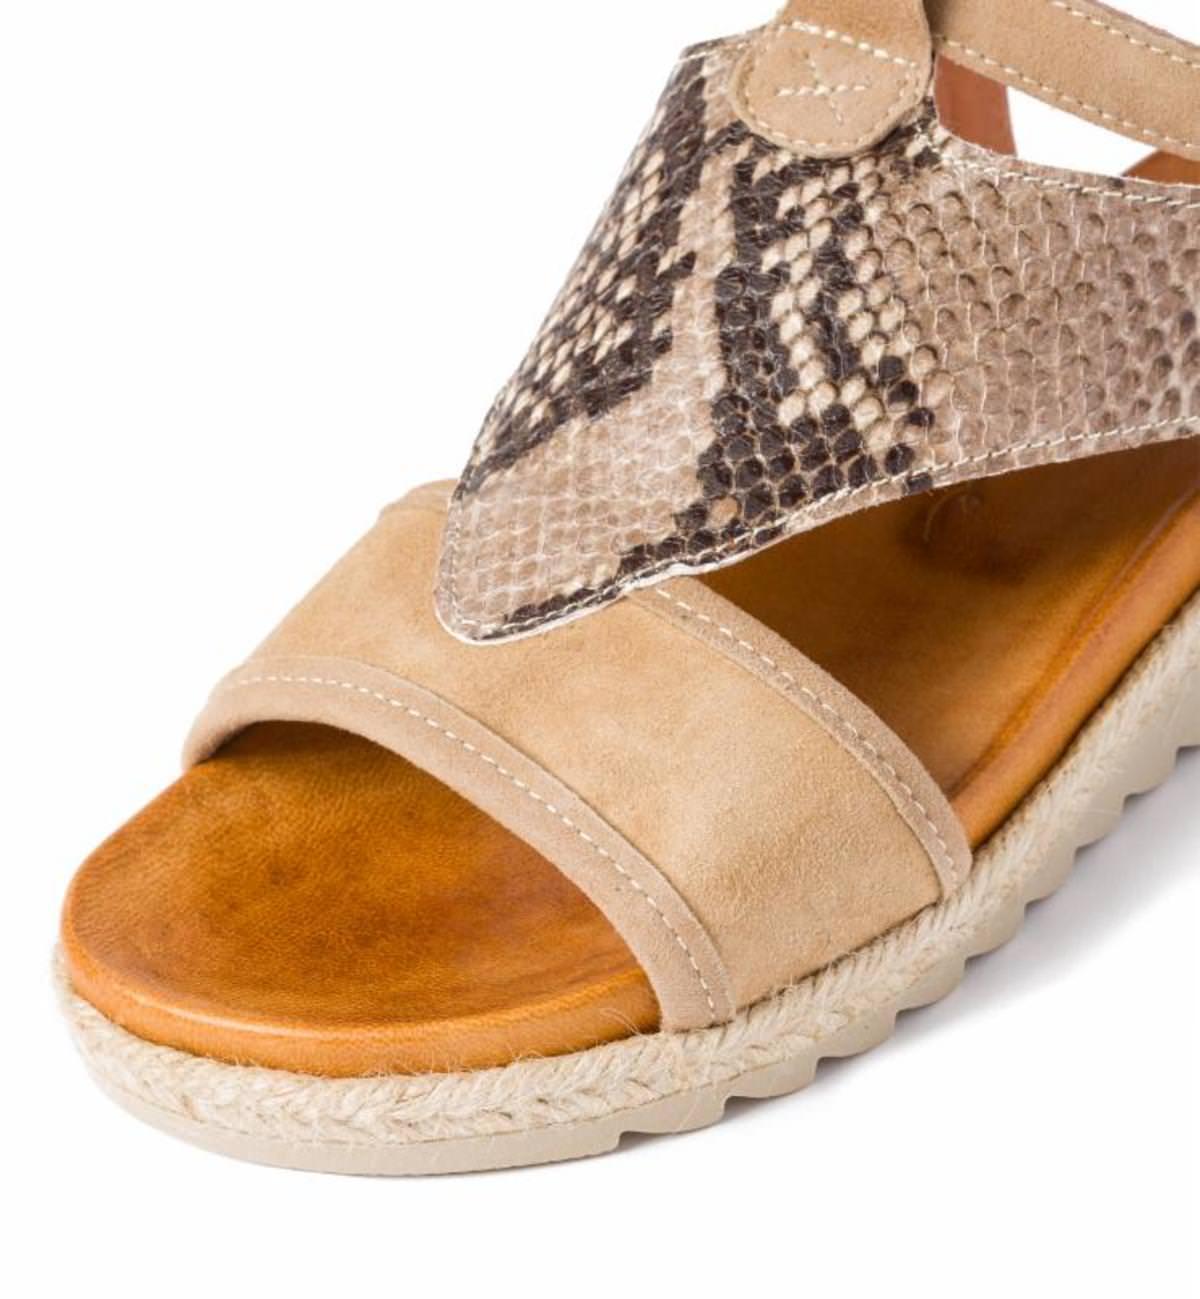 Sandale mit Kroko-Leder Beige LaShoe 0T9zC1tI